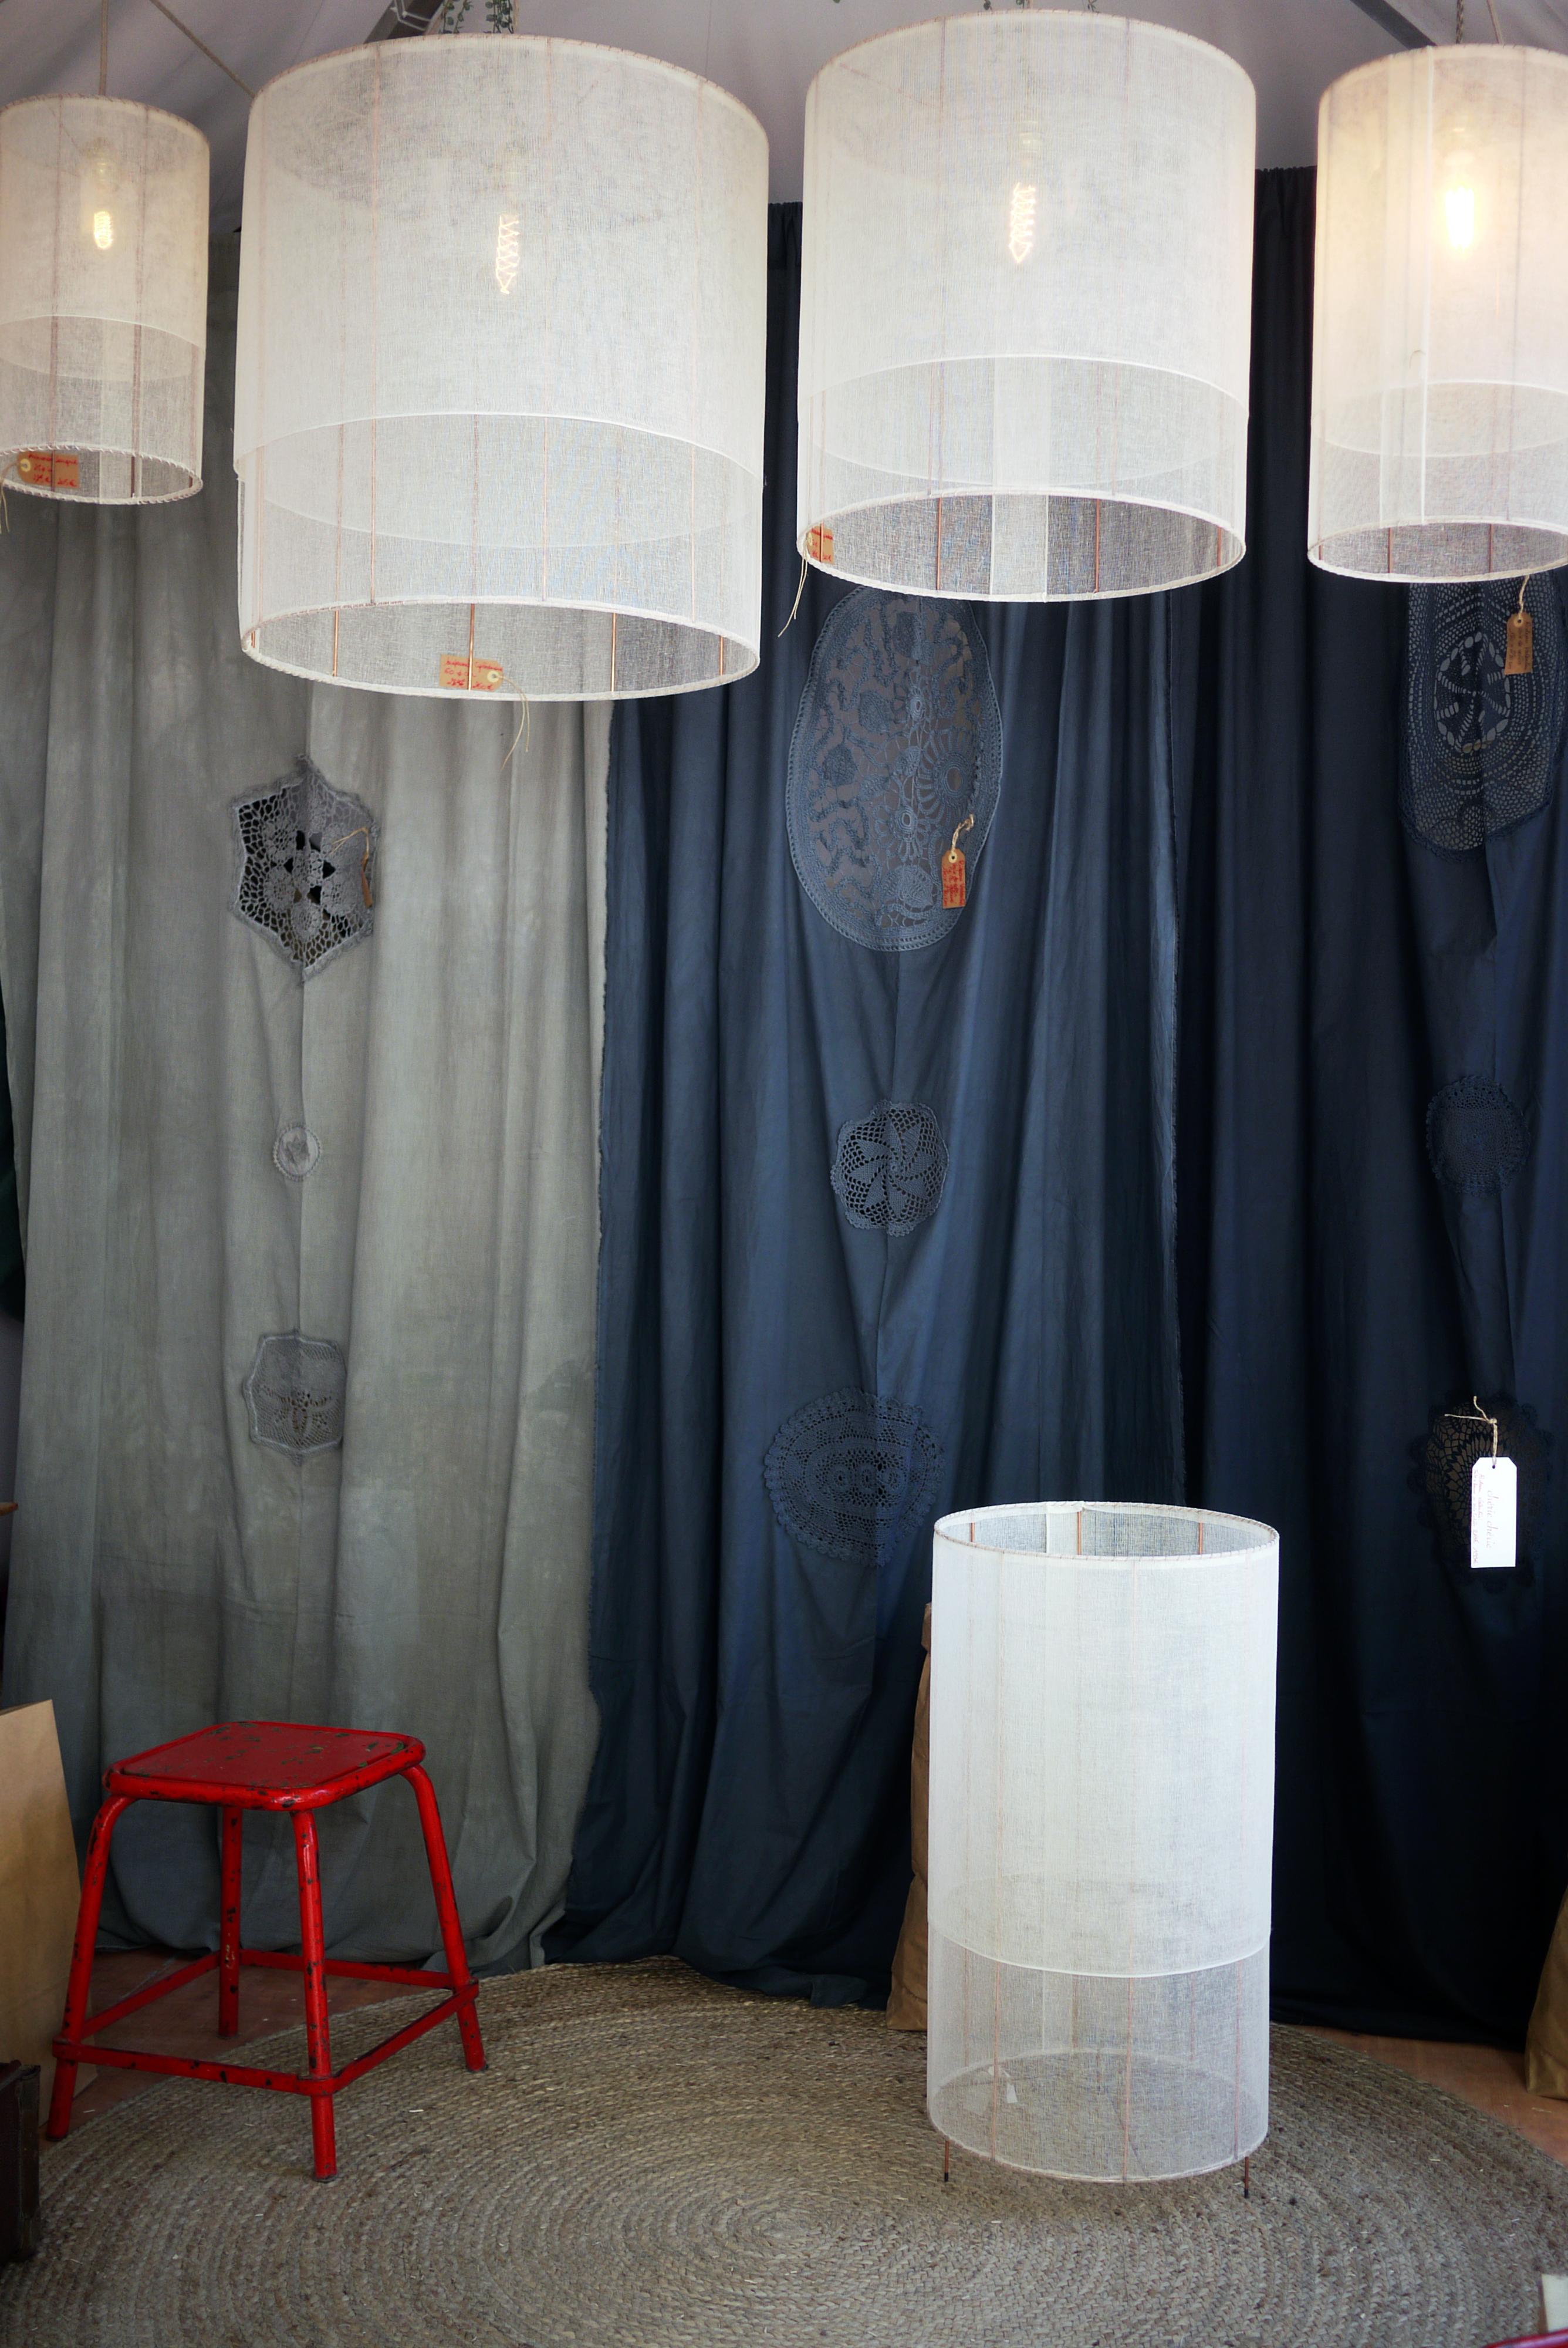 Bracelets LOOM - Design textile by Myriam Balaÿ myriam-balay-cherie6-ambiance CHERIE CHERIE L'appartement